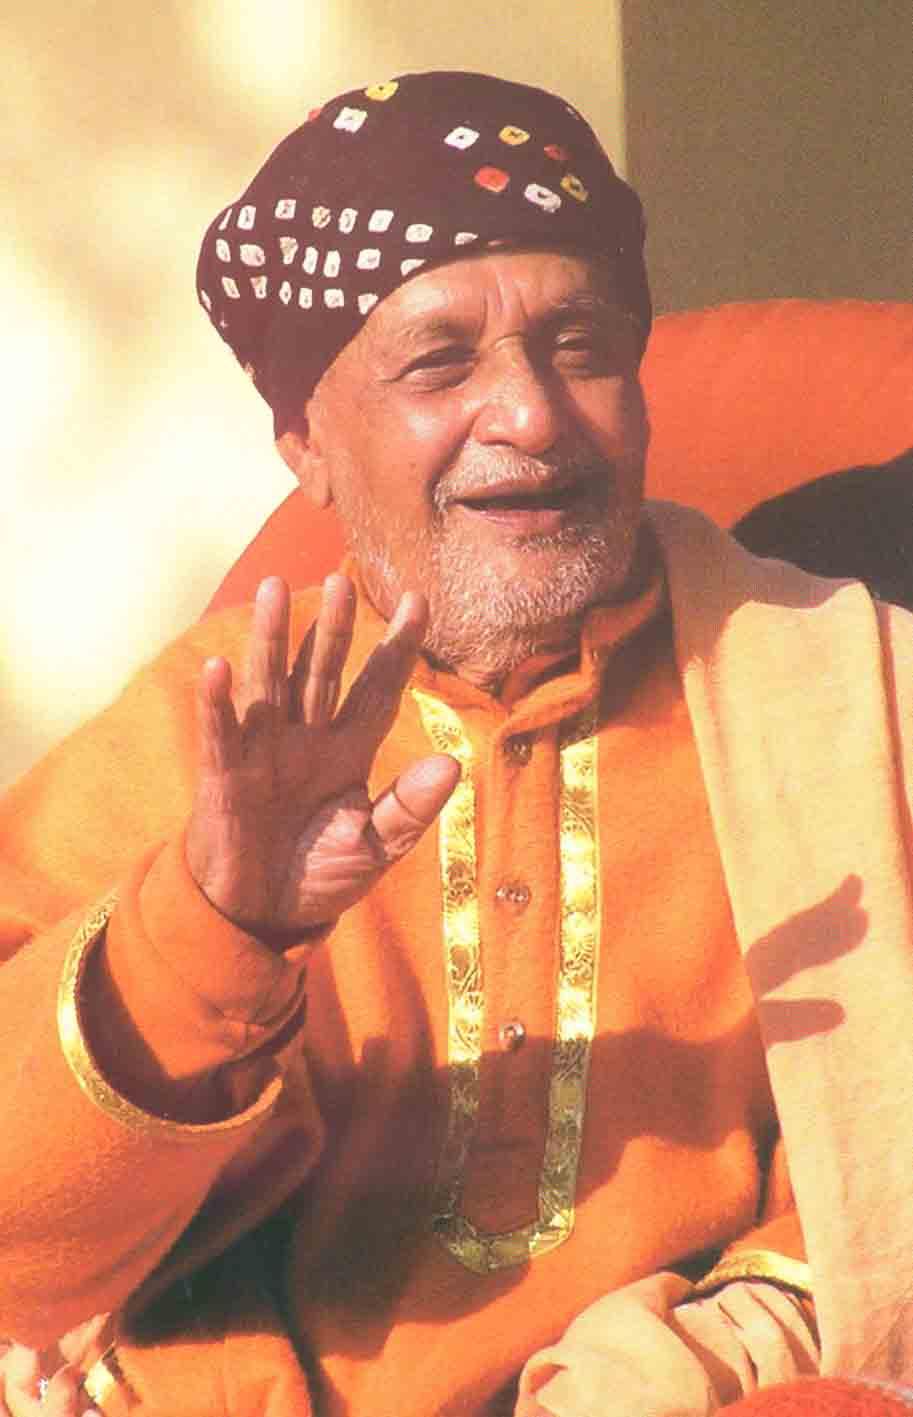 Guru Paramahamsa Satyananda Saraswati - Master of Tantra Kriya Yoga